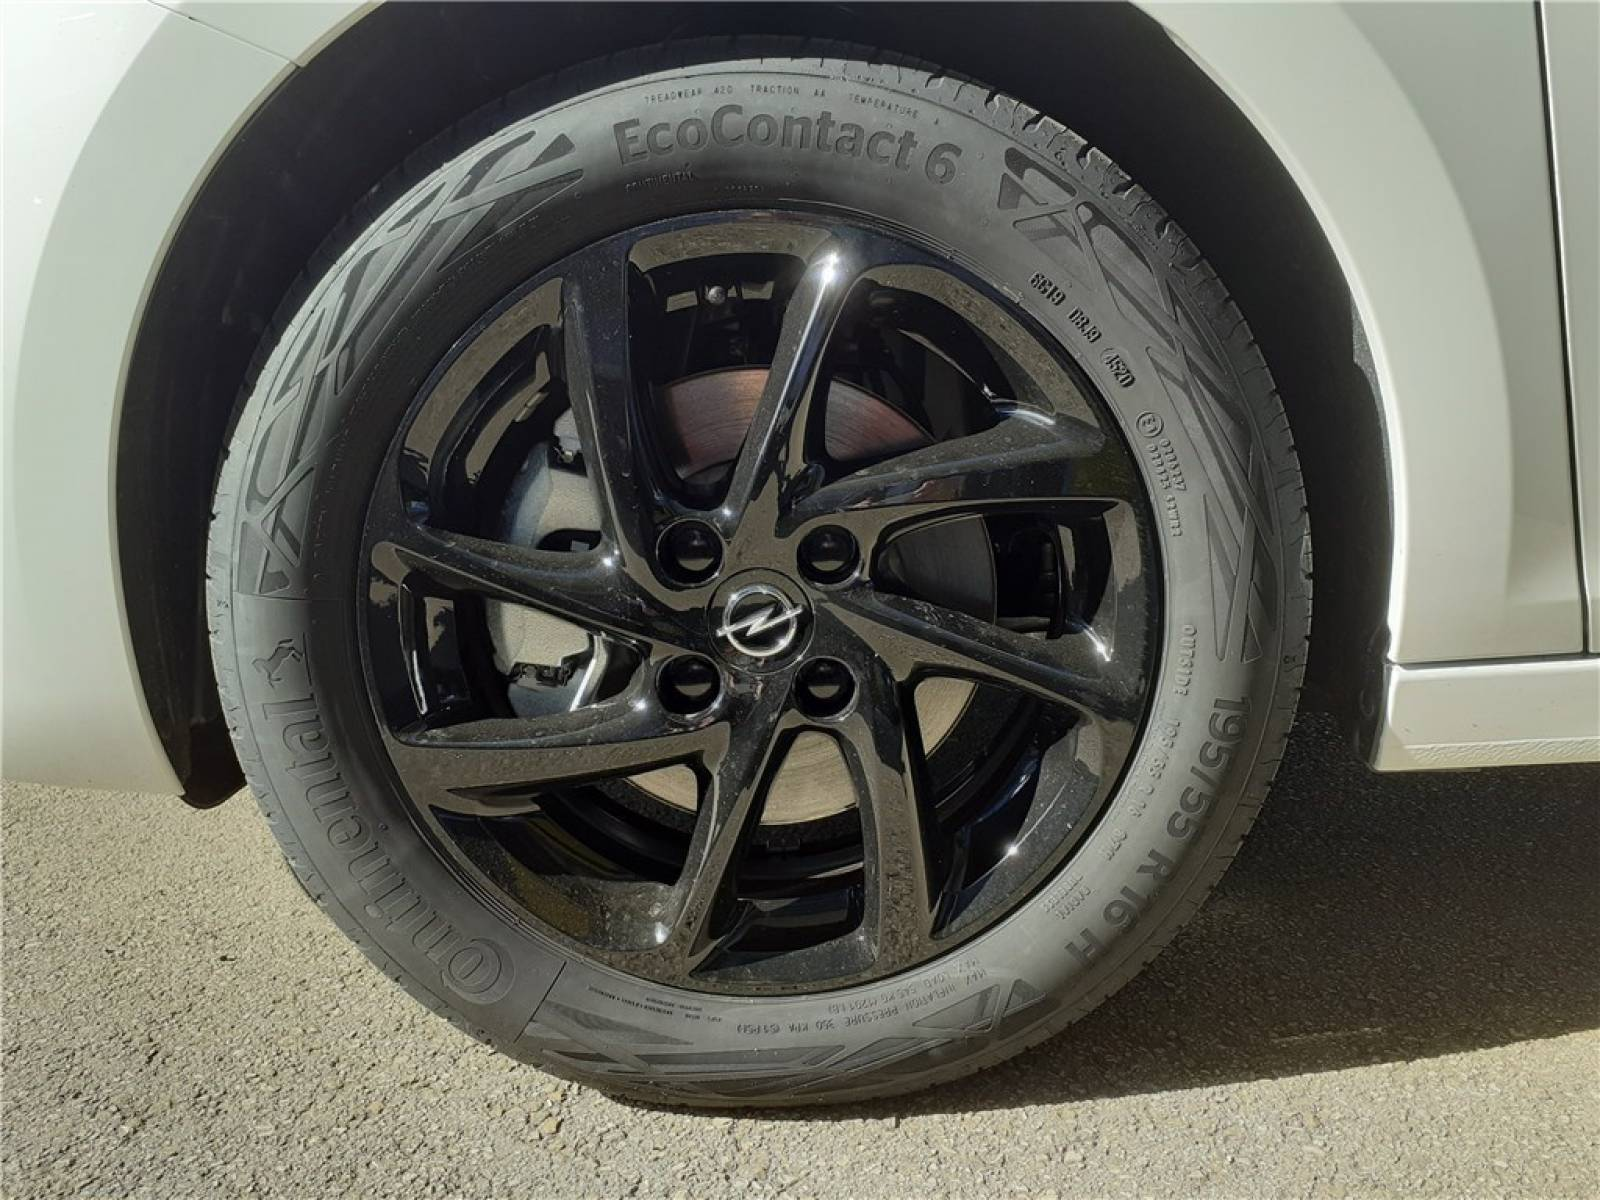 OPEL Corsa 1.2 Turbo 100 ch BVM6 - véhicule d'occasion - Groupe Guillet - Opel Magicauto - Chalon-sur-Saône - 71380 - Saint-Marcel - 8